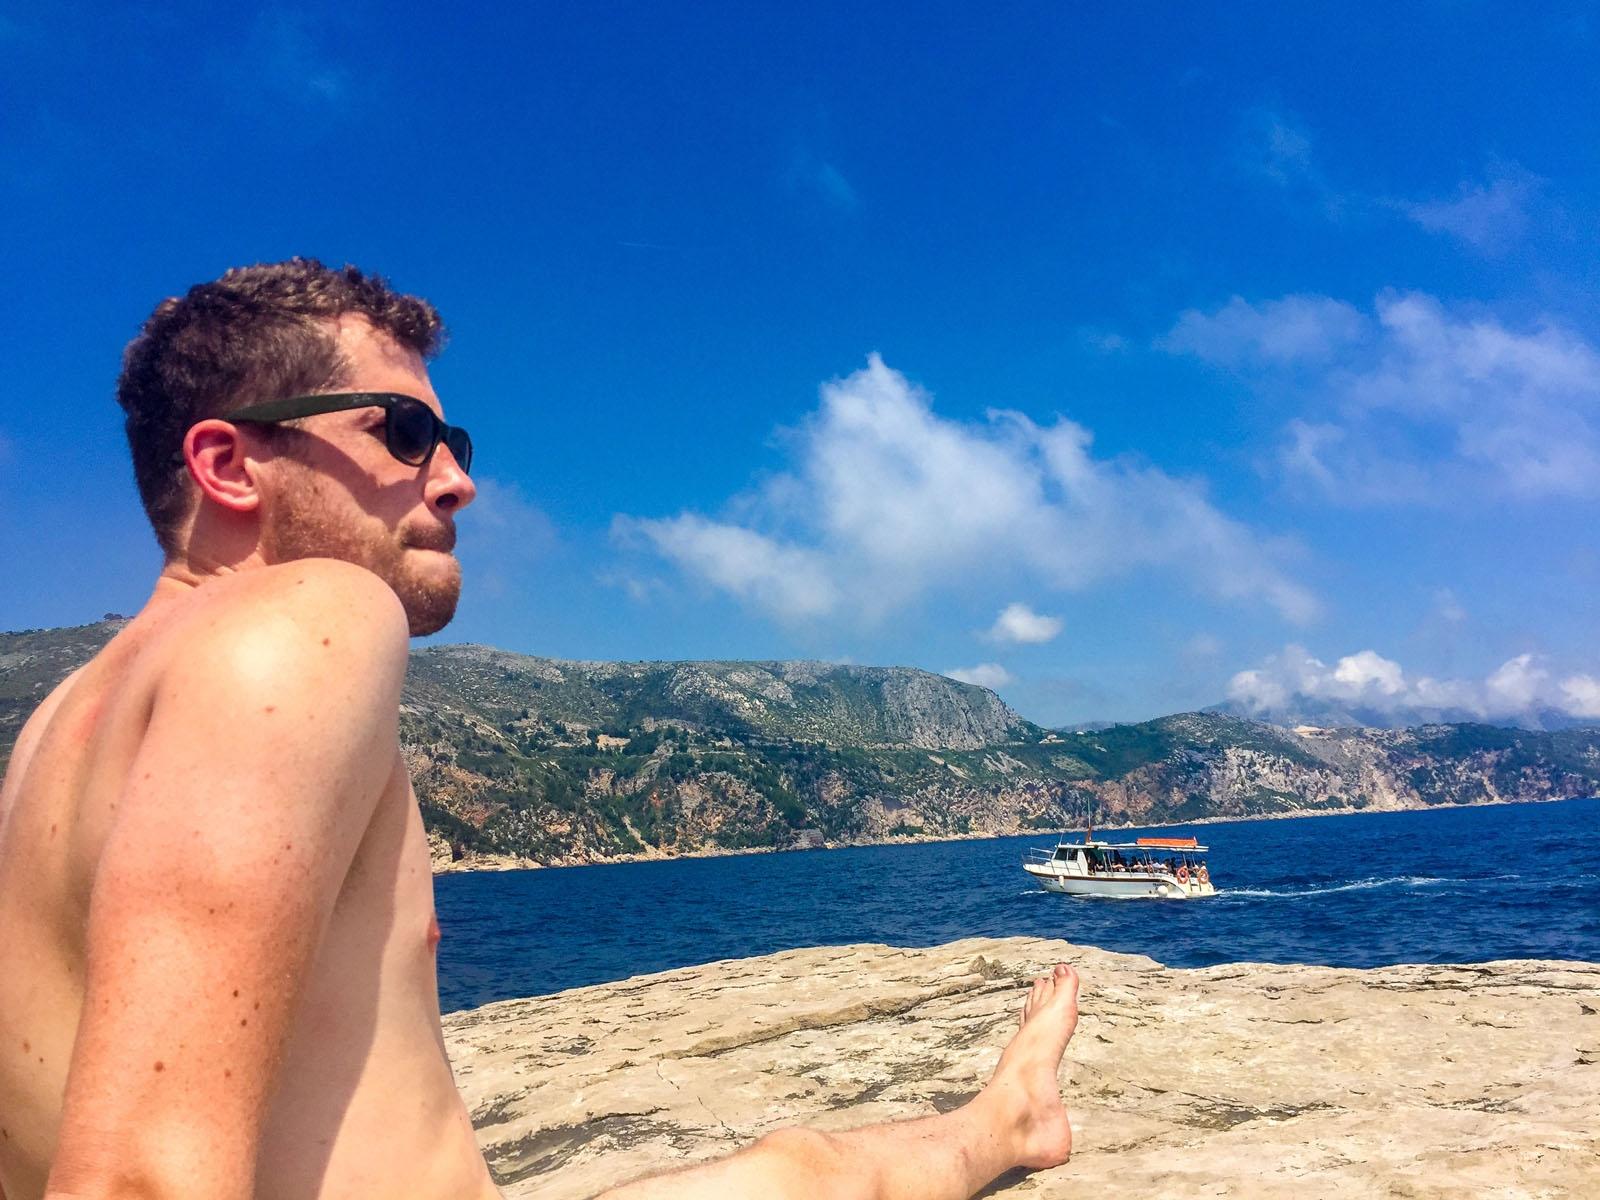 Redheaded college naked men in croatia women